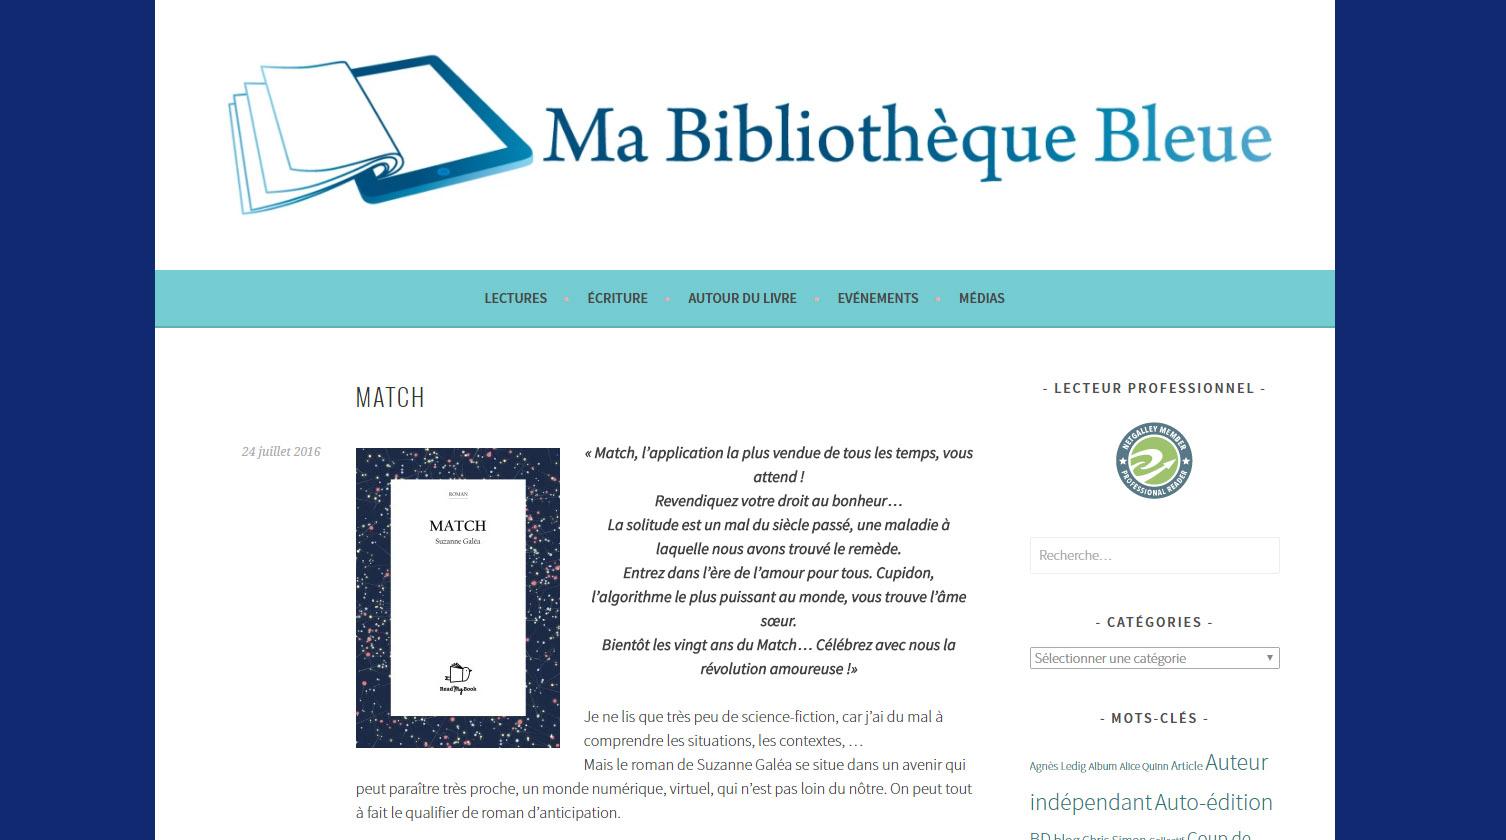 Ma bibliothèque bleue : Match, de Suzanne Galéa